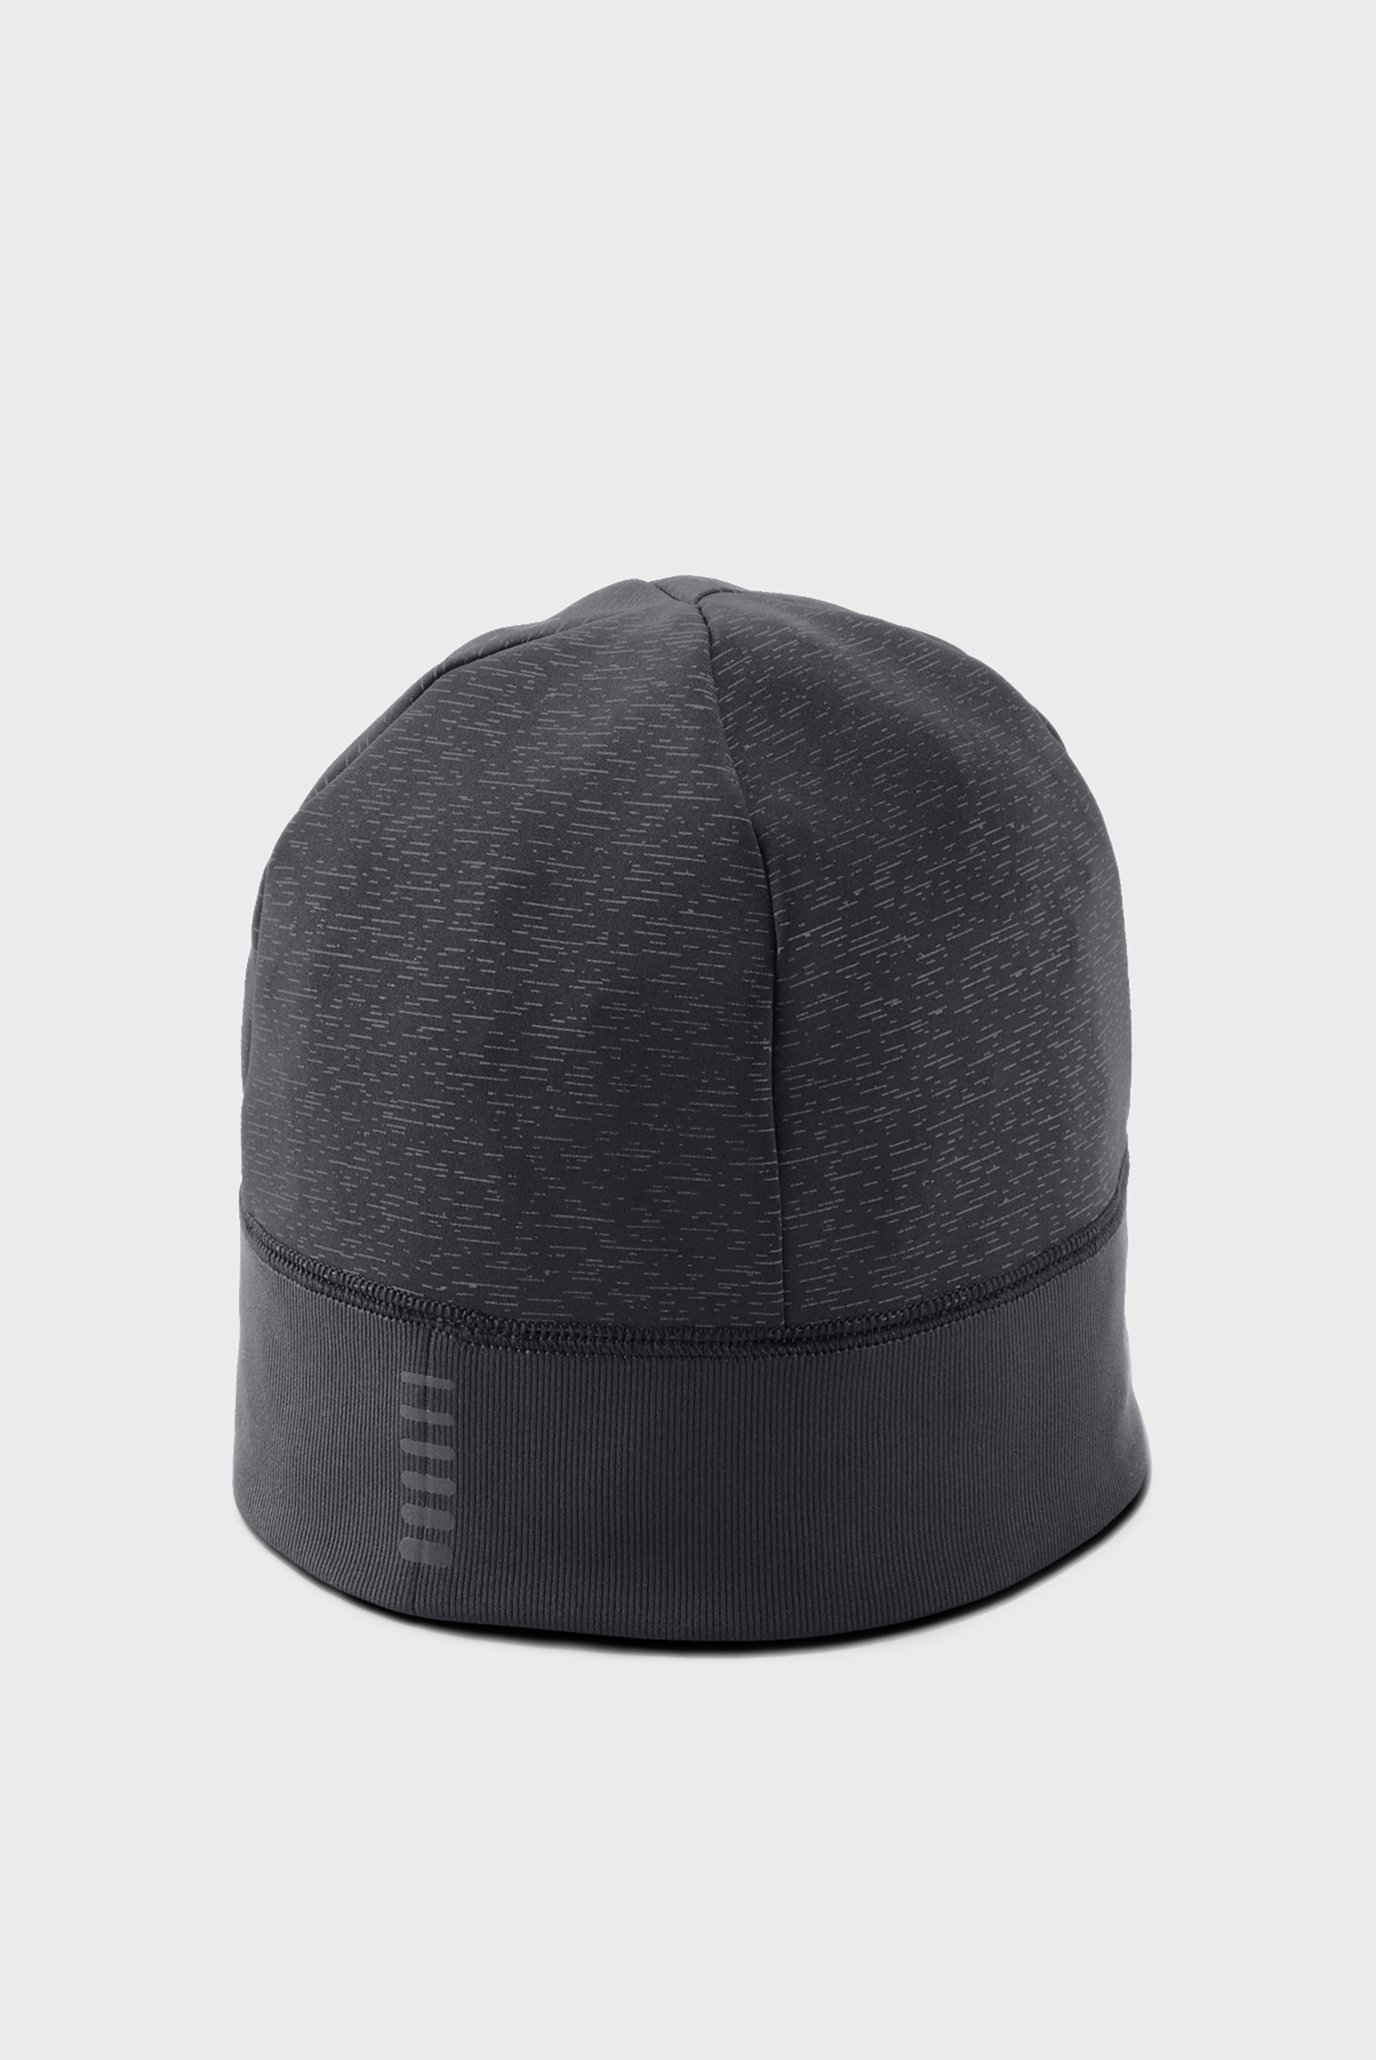 9e54e28da31 Купить Мужская черная шапка Mens Storm Run Beanie Under Armour Under Armour  1318520-001 – Киев